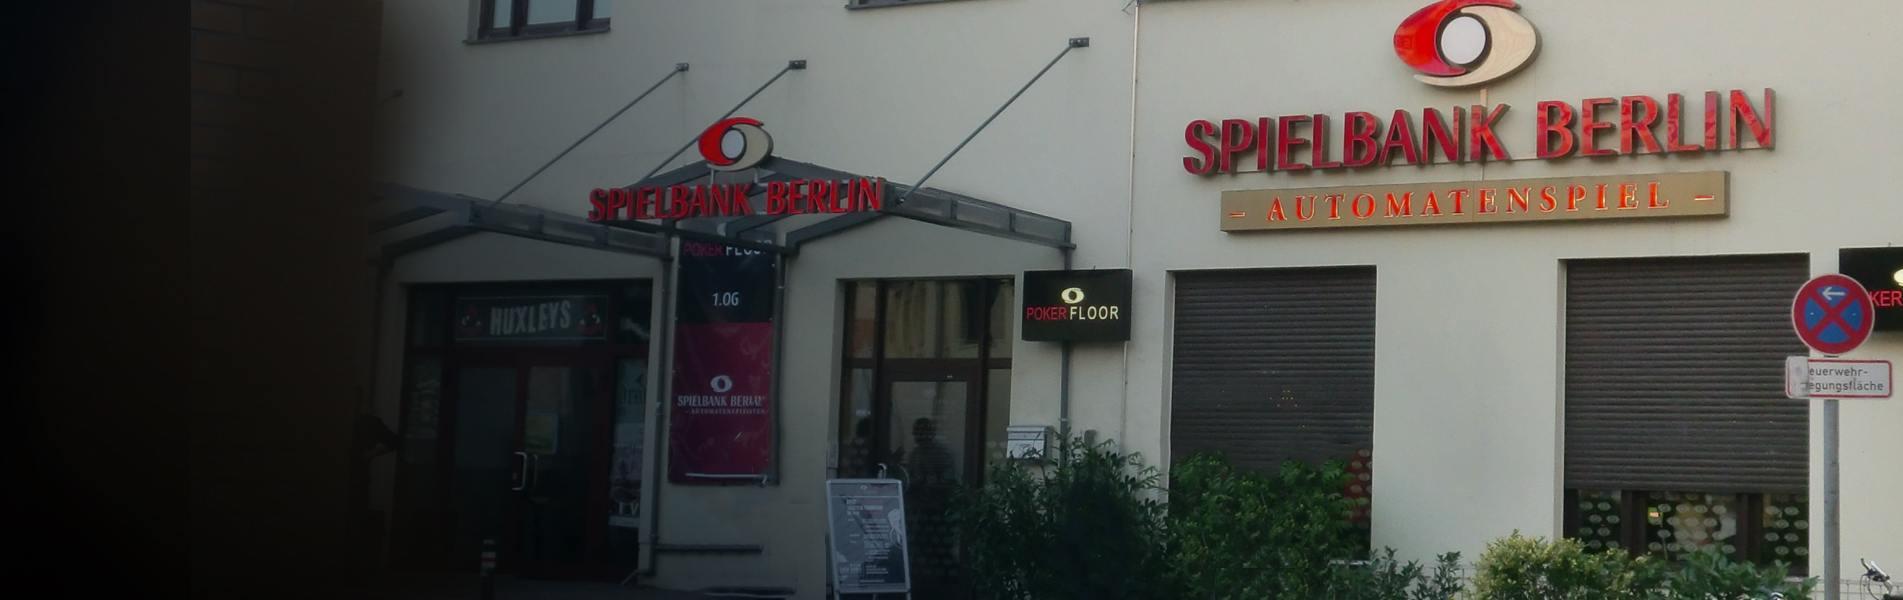 Spielbank Berlin-Hasenheide in Neukölln